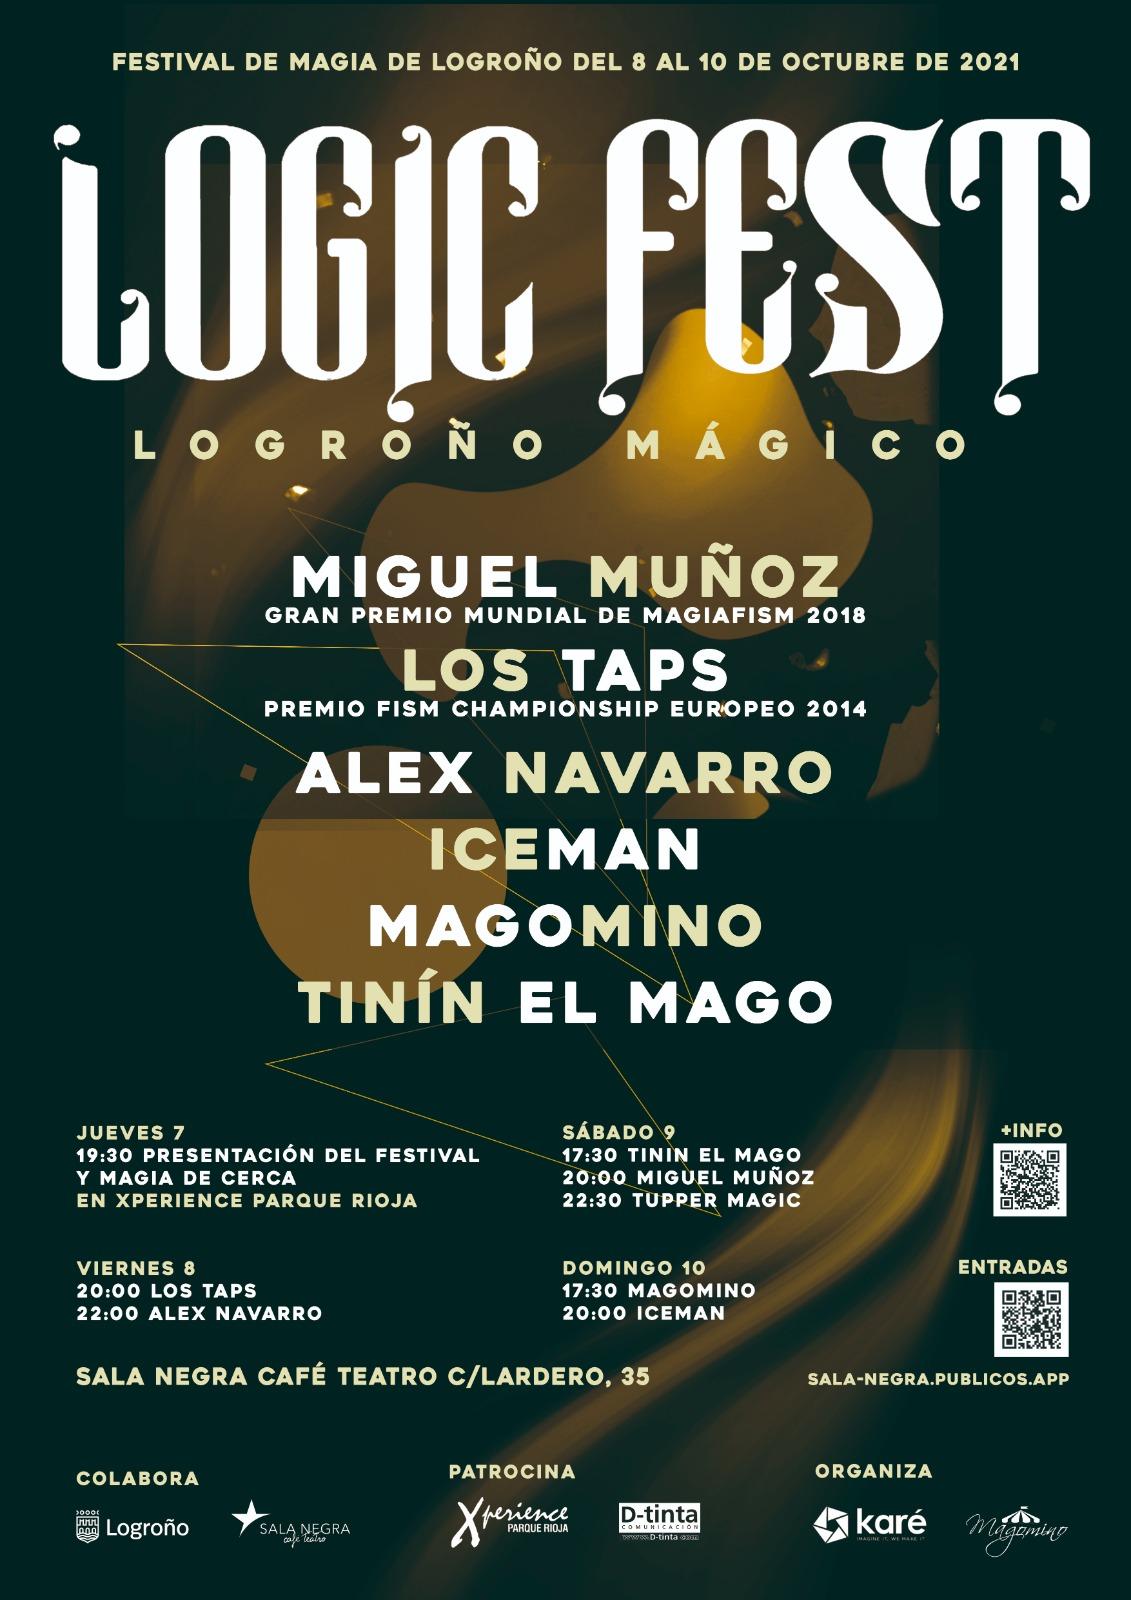 festival-de-magia-logic-fest-logrono